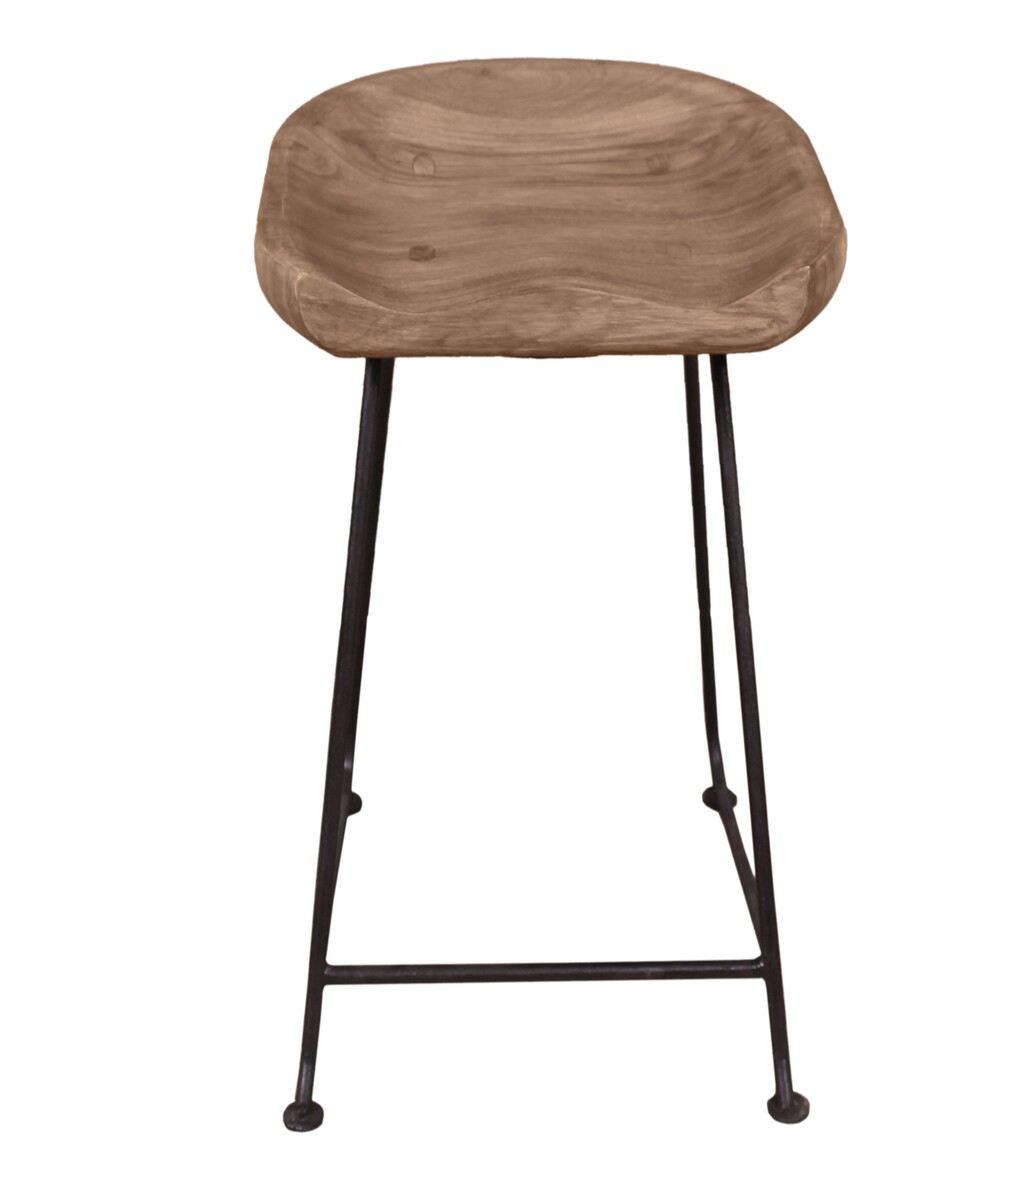 Barhocker Sitzschale Aus Akazienholz Stabiles Gestell Aus Metall Schwarz